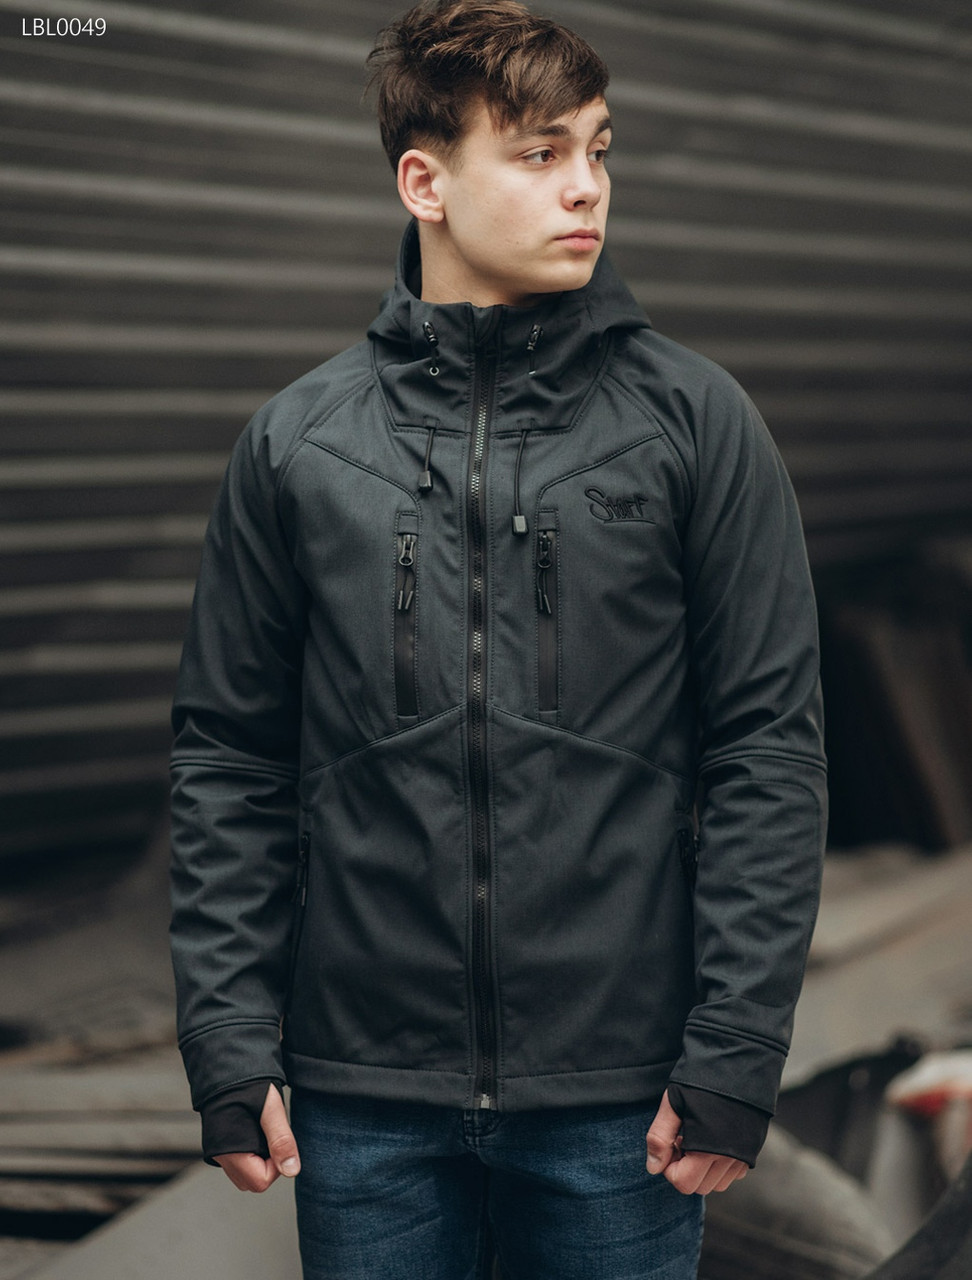 74b37e45286 Куртка Staff softshell grafit - Интернет магазин Babuza в Черновцах